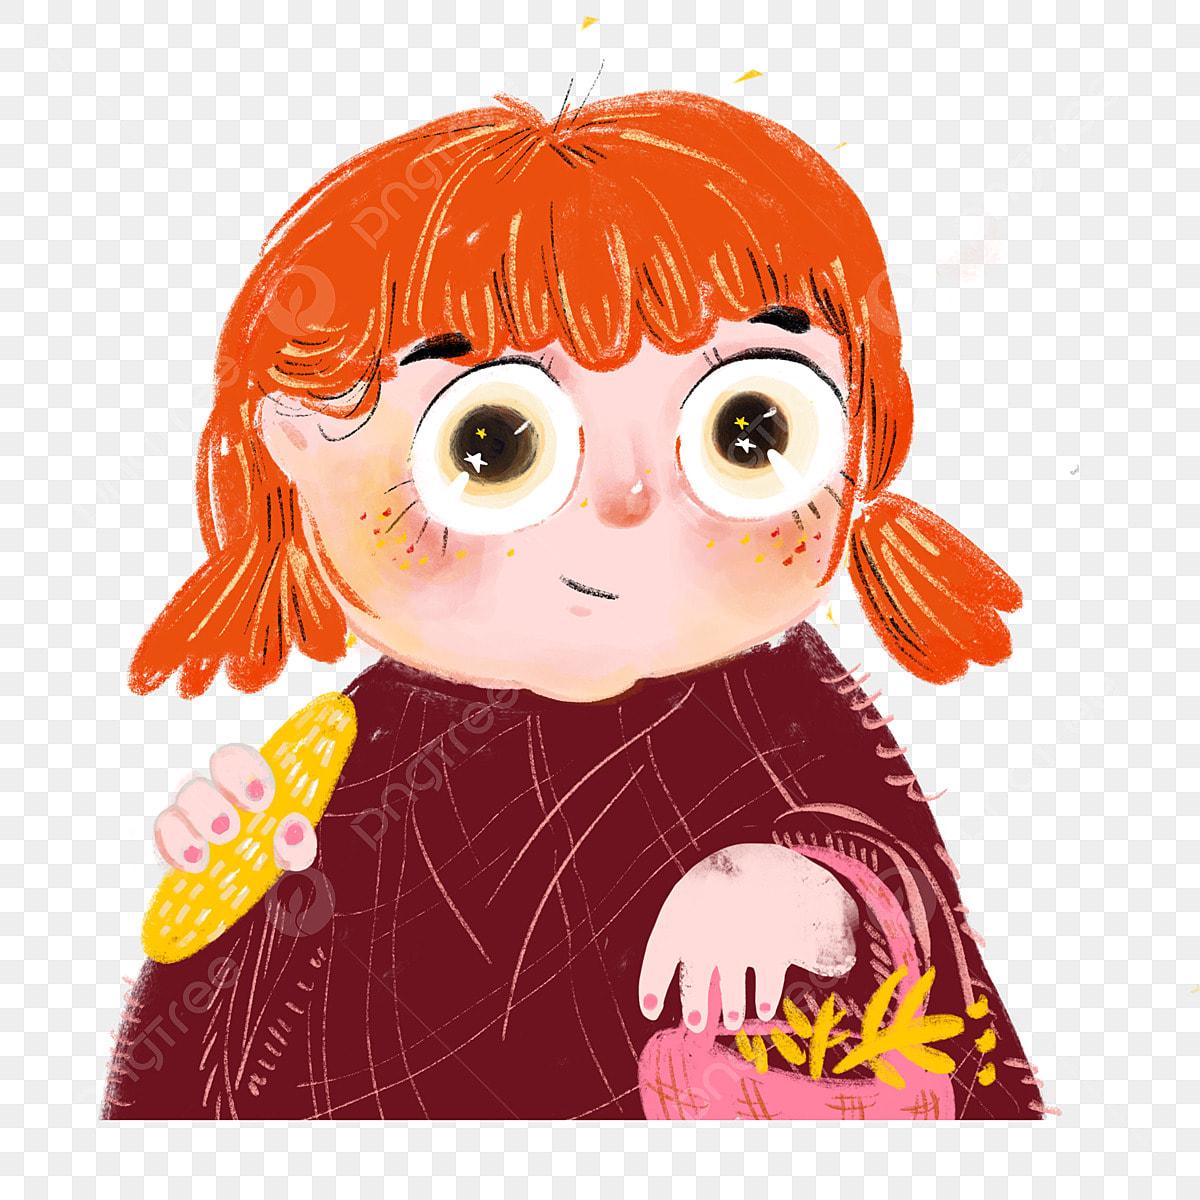 Cute Girl With Big Eyes Picking Flowers Cartoon Girl Orange